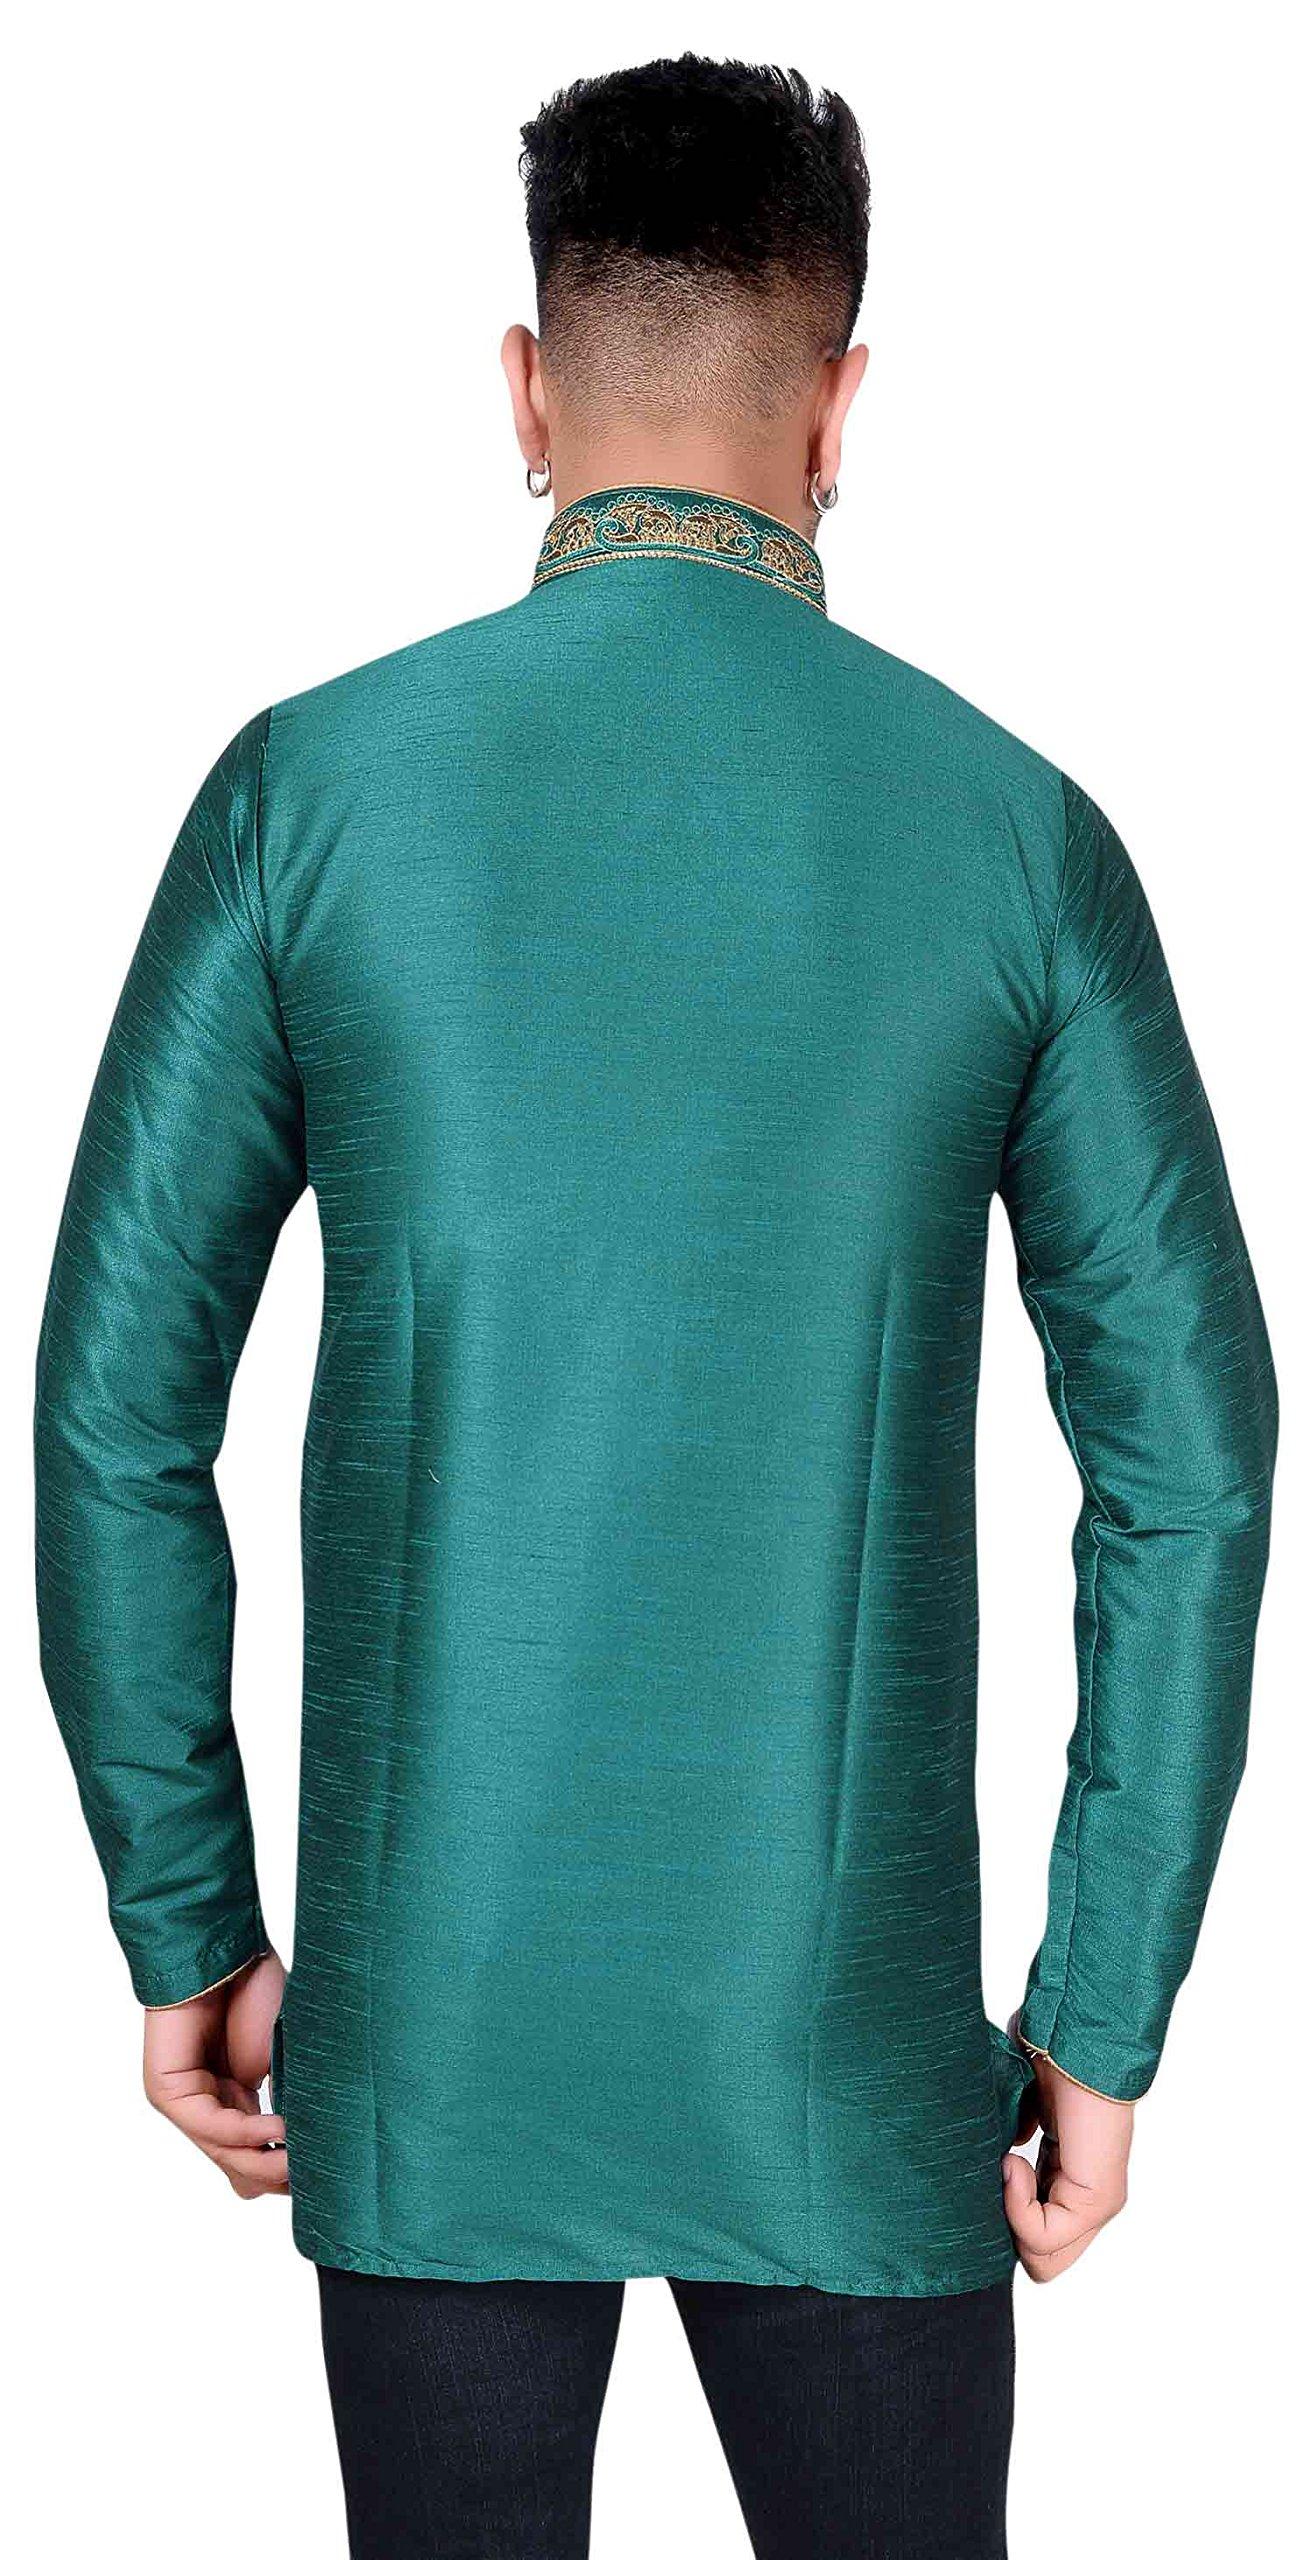 Men's Kurta Bollywood Party Wear Short Shirt 2006 (XXXL (Chest- 46 inches), Teal) by Desi Sarees (Image #2)